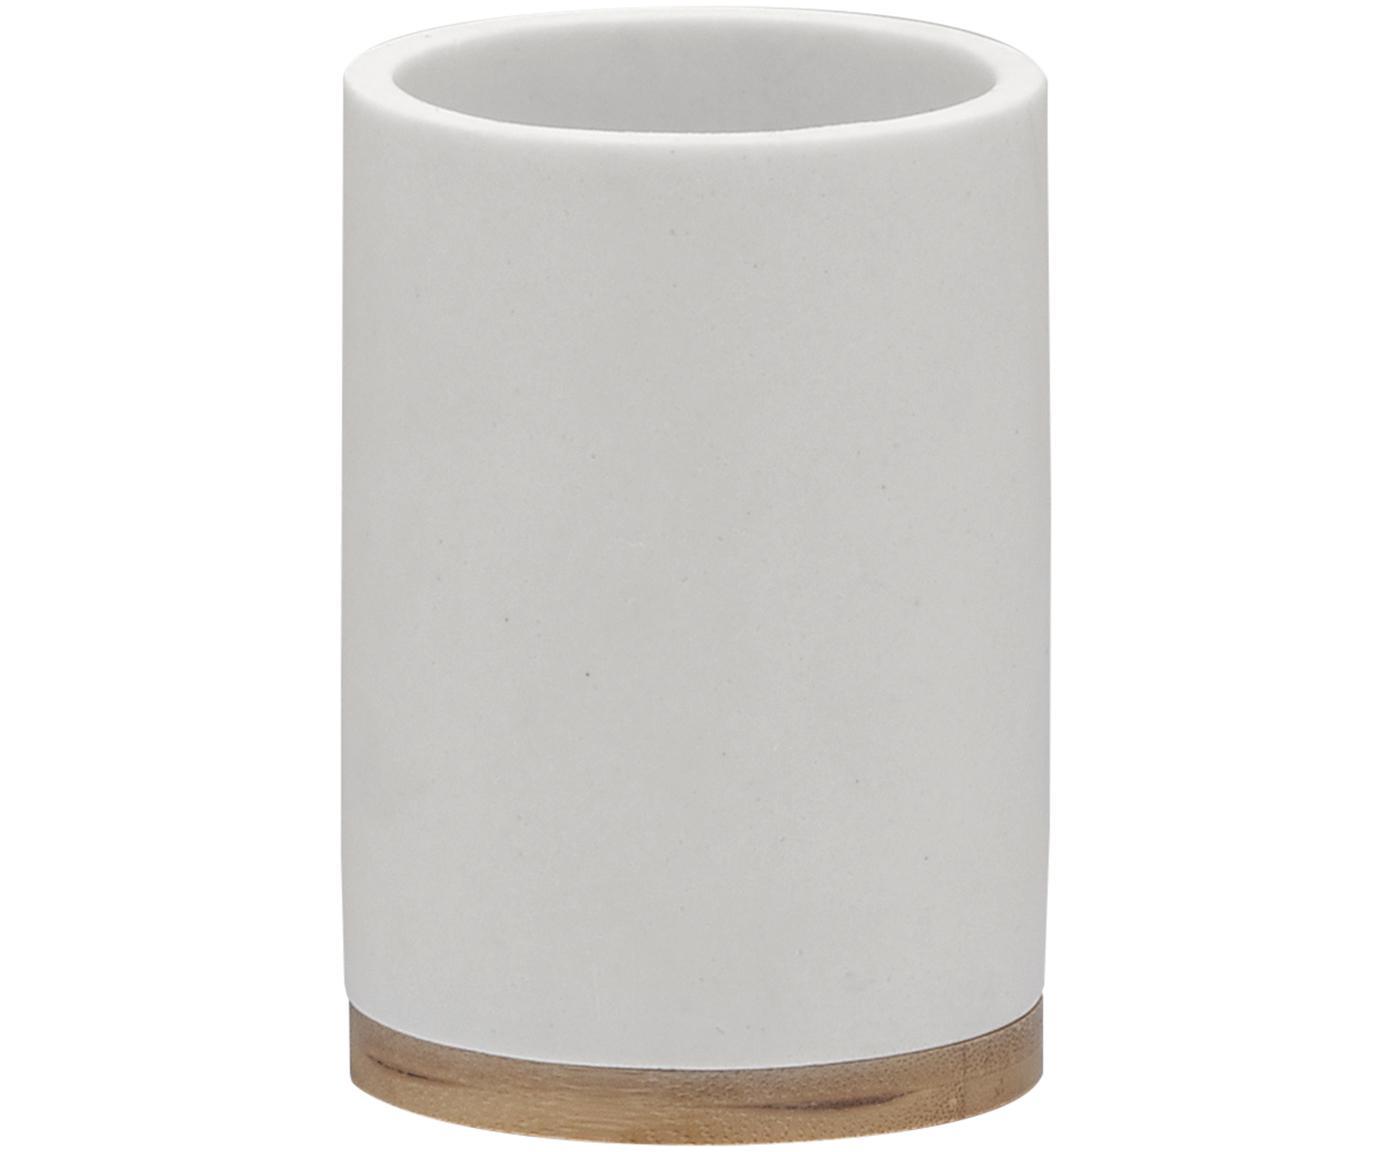 Porta spazzolini  Grace, Recipiente: poliresina, Bianco, Ø 7 x Alt. 11 cm